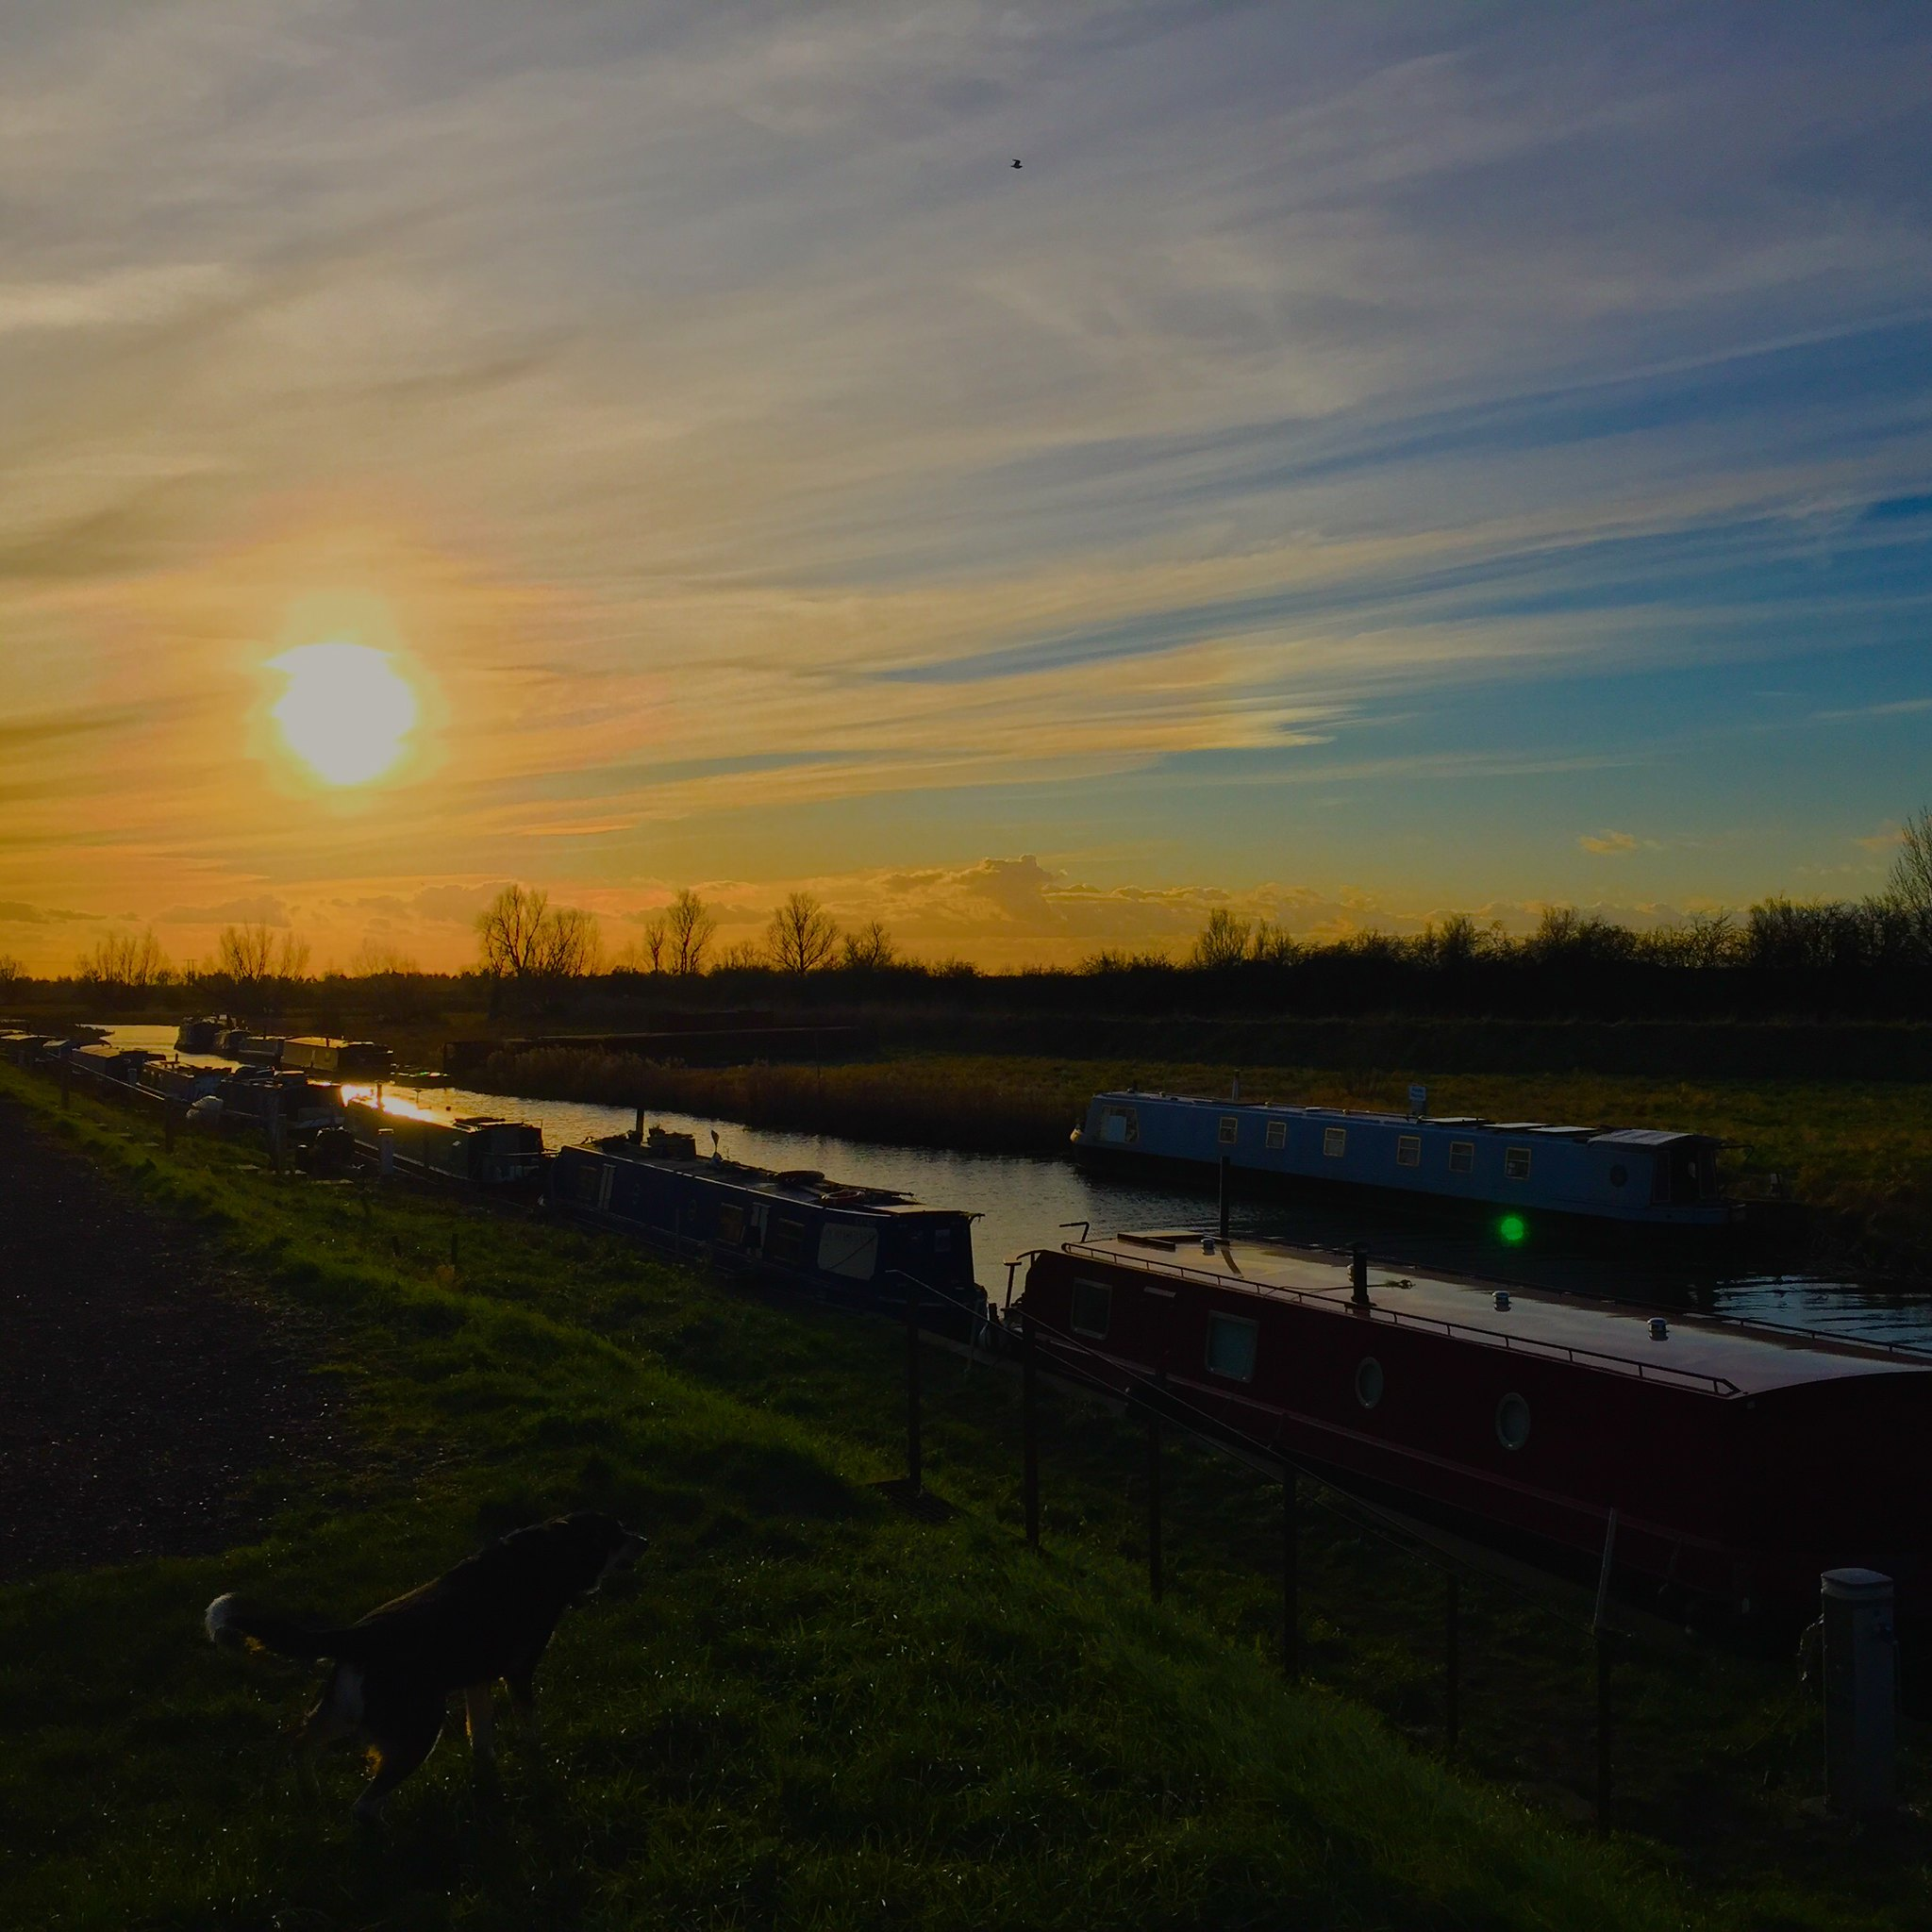 Fenland waterway at sunset